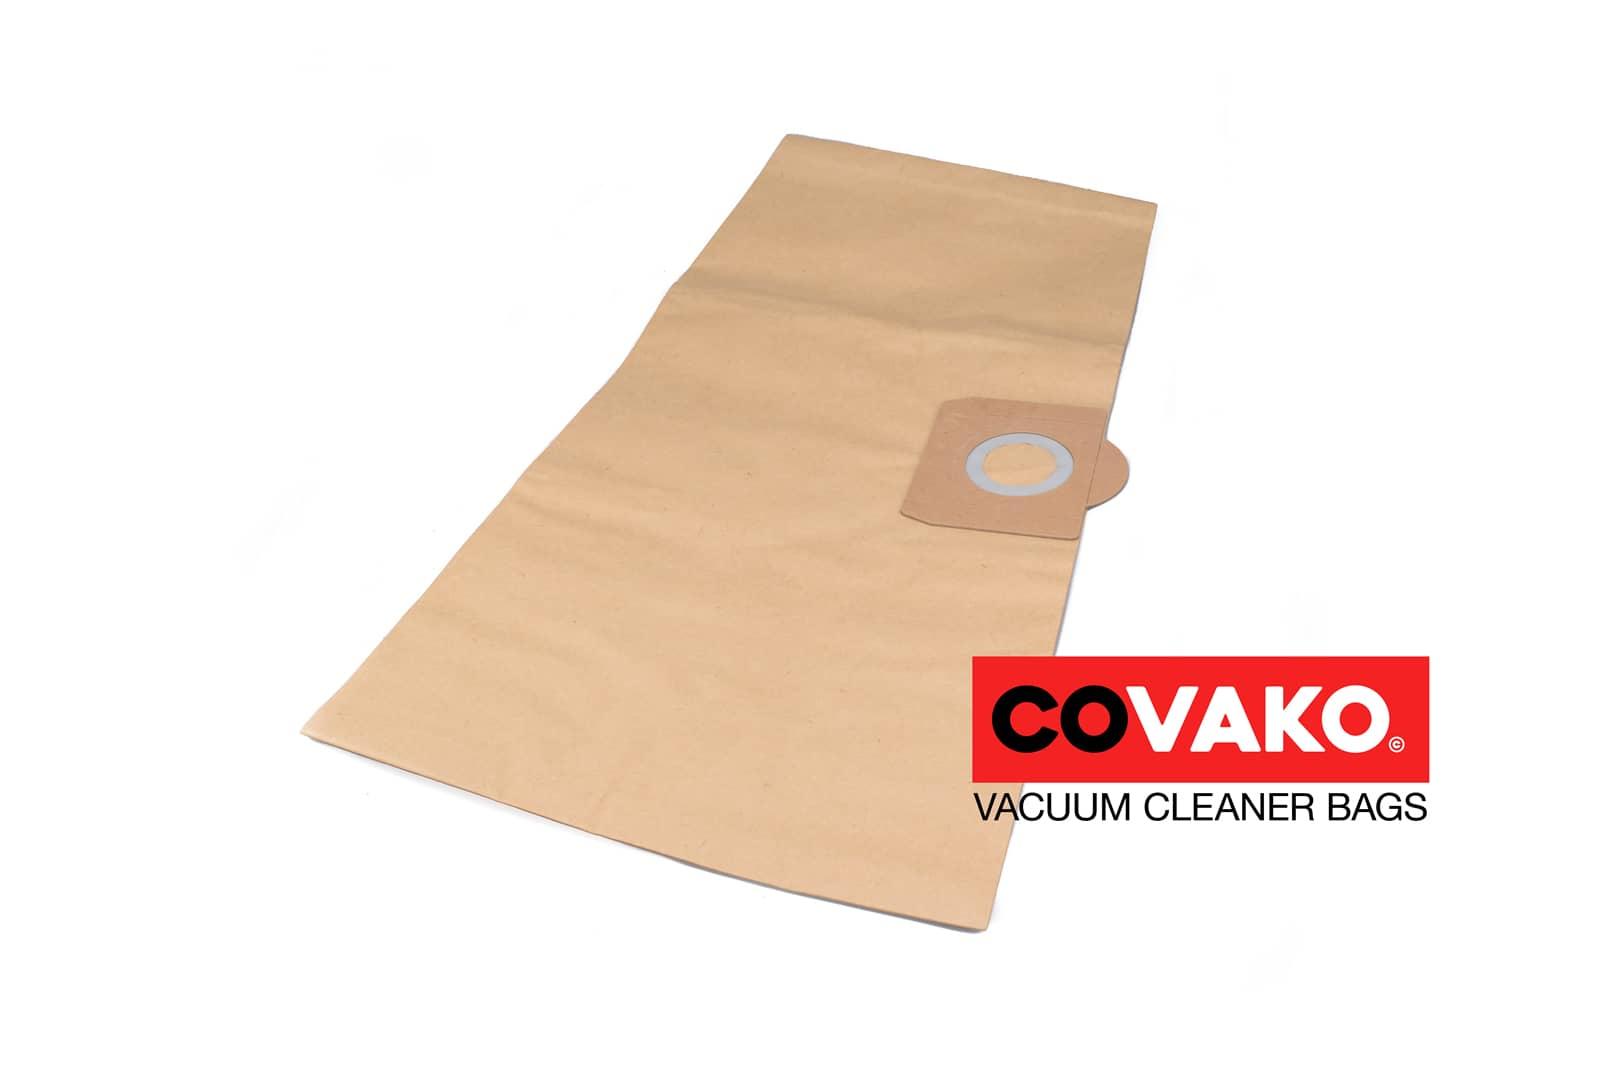 Nilco IC 314 / Papier - Nilco sacs d'aspirateur